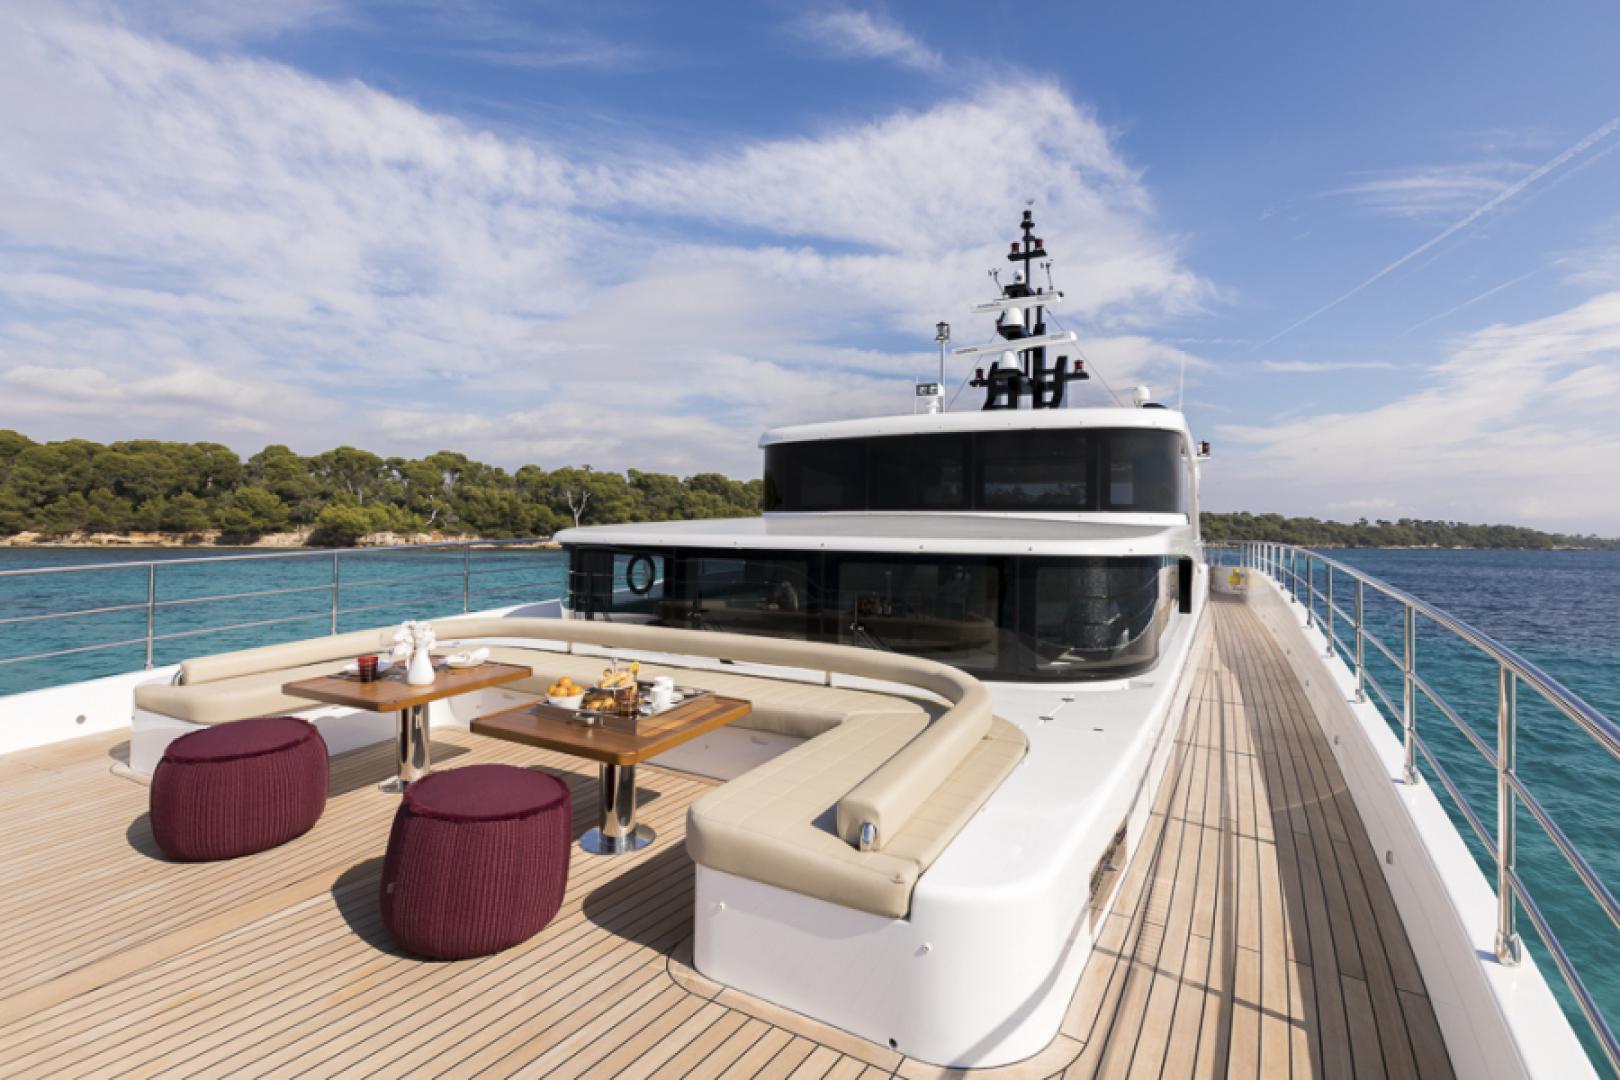 Majesty Yachts-Majesty 100 2022-MAJESTY 100 United Arab Emirates-Fore Deck-1604968